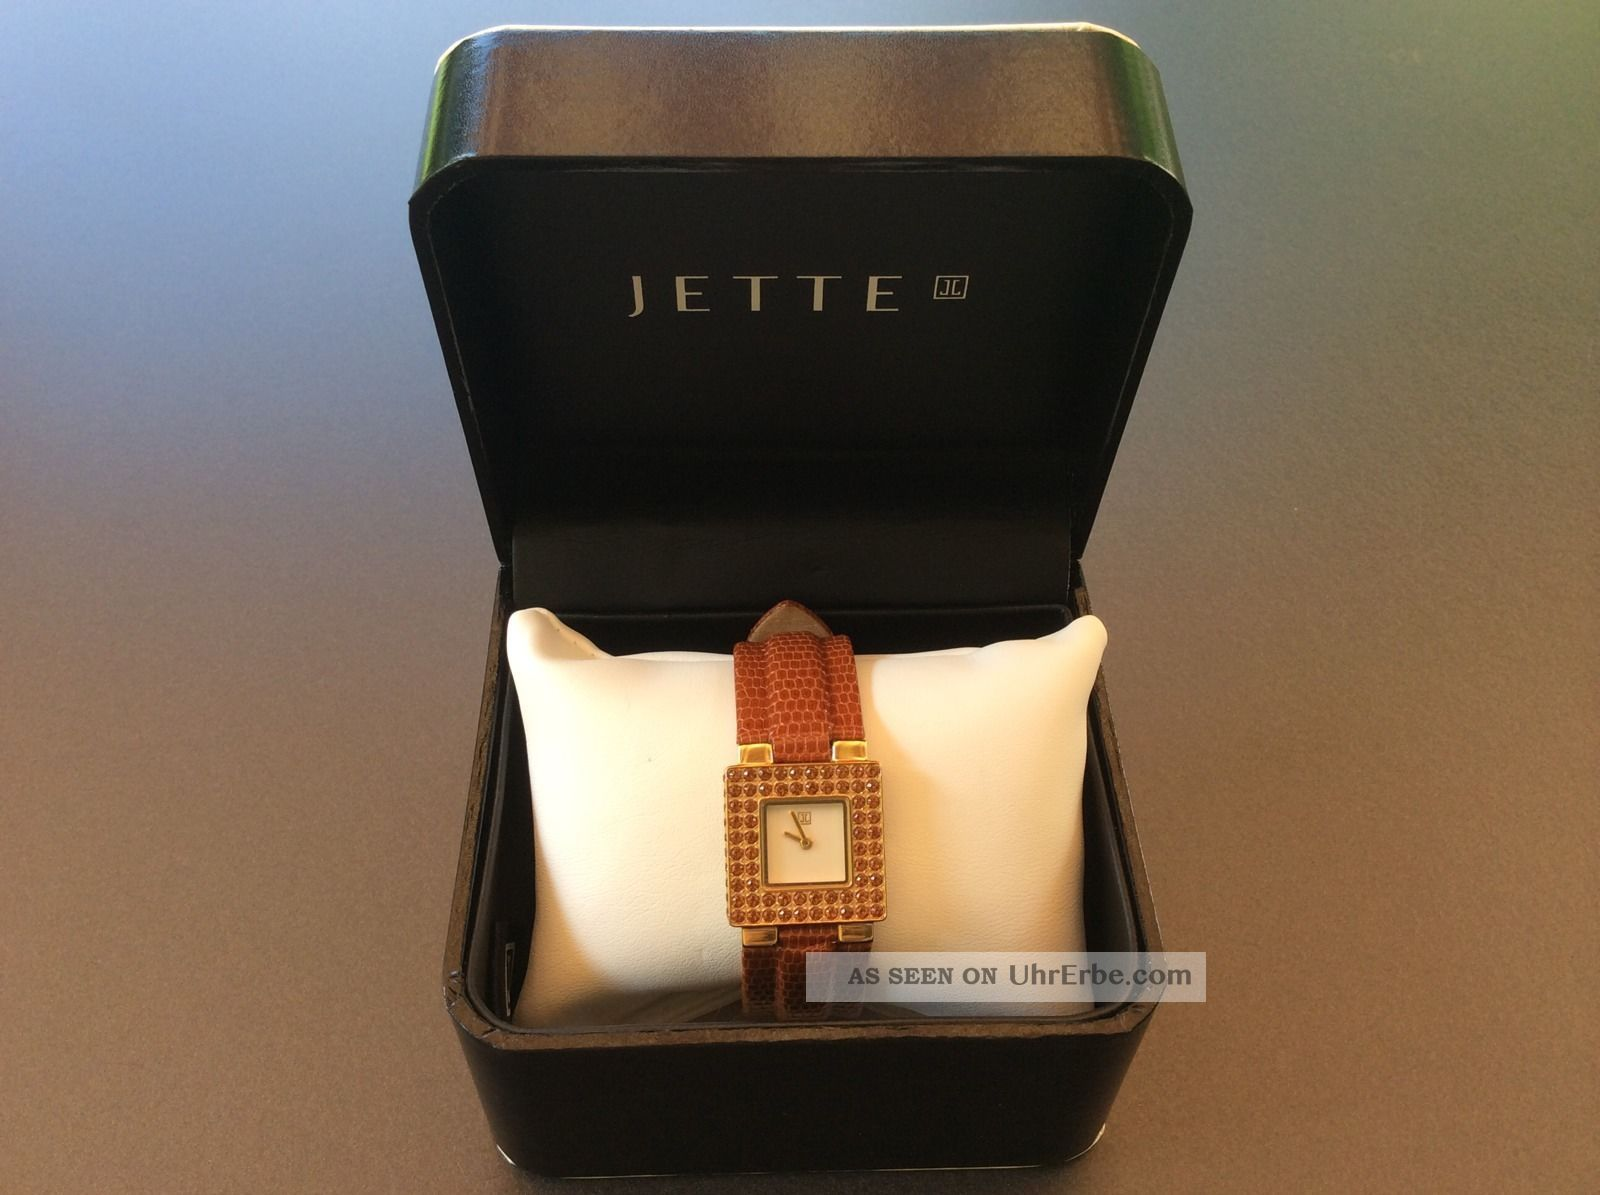 Jette Joop Armbanduhr Goldfarbiges Gehäuse Mit Braunem Lederarmband Wie Armbanduhren Bild